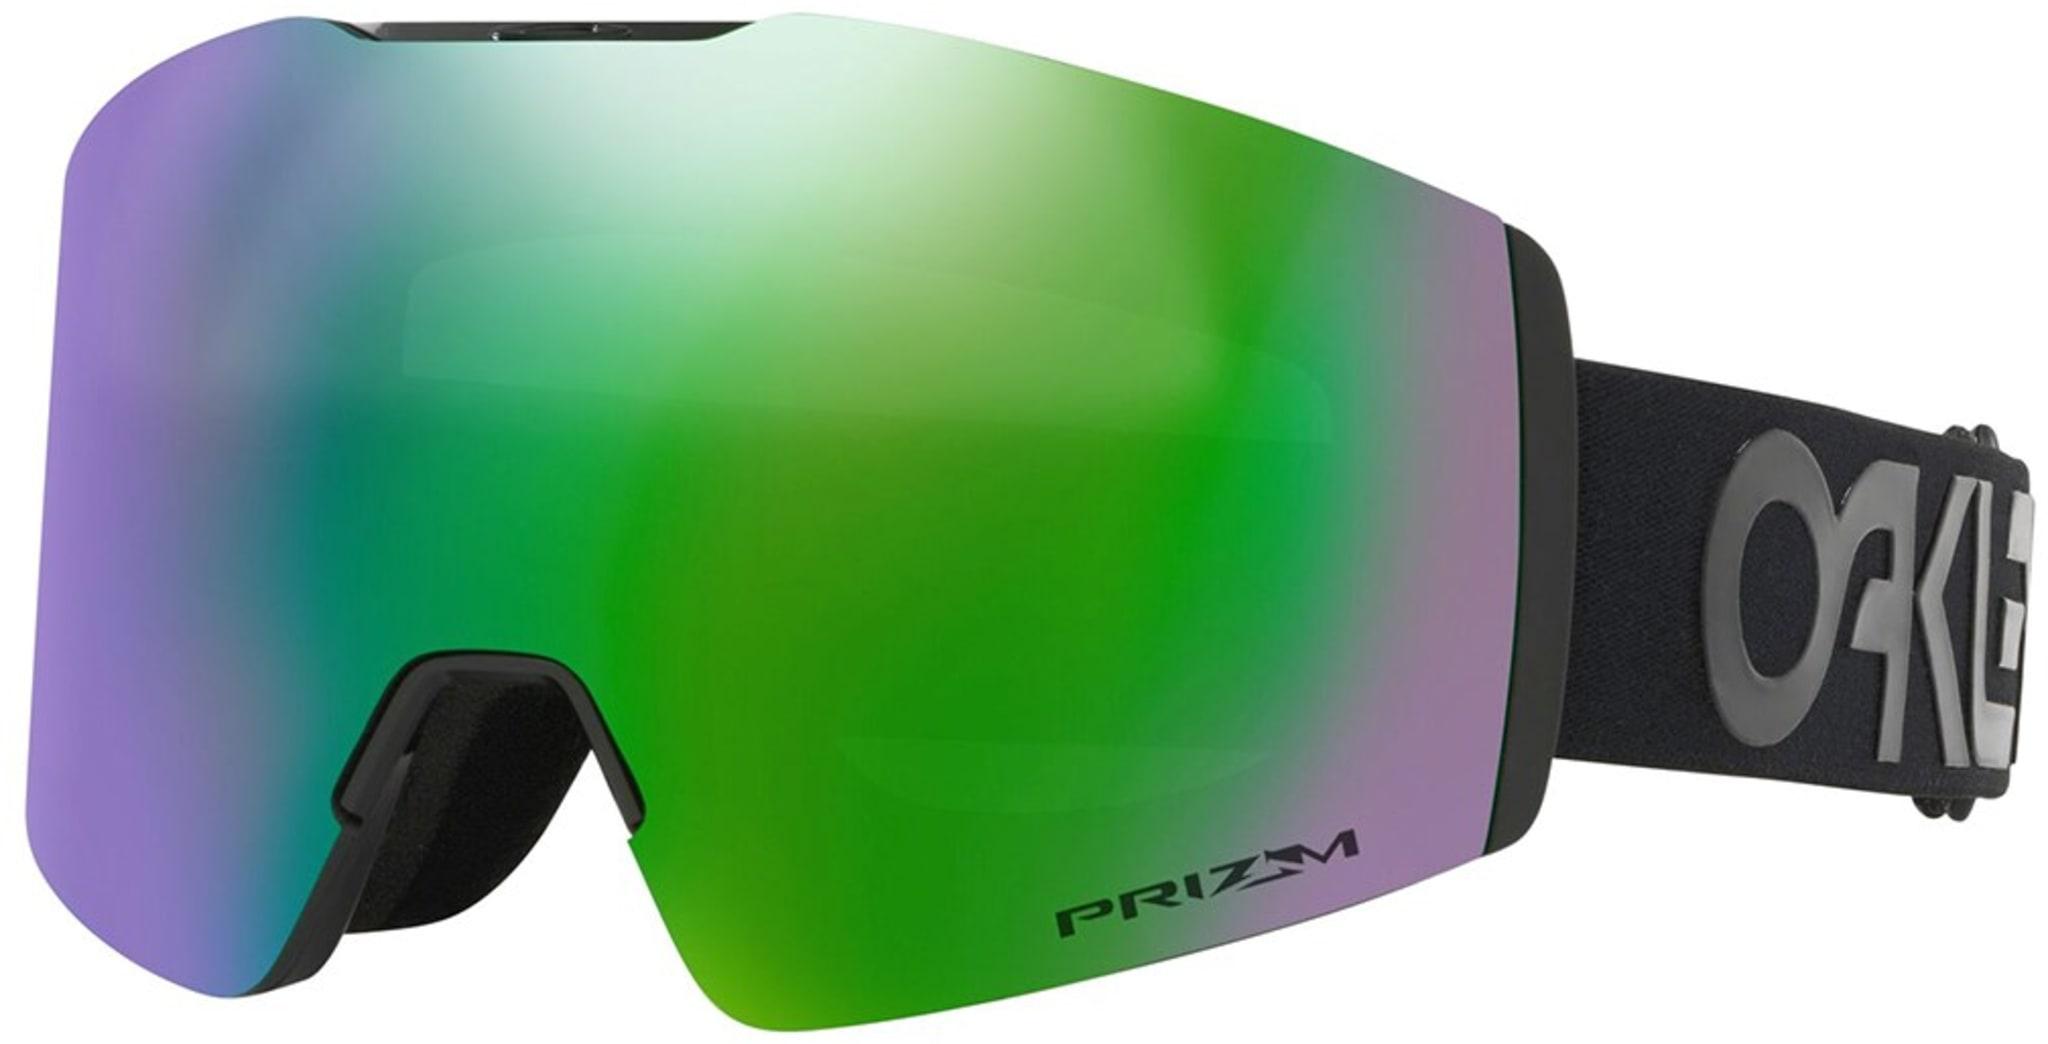 Mellomstor skibrille med sylyndriske glass